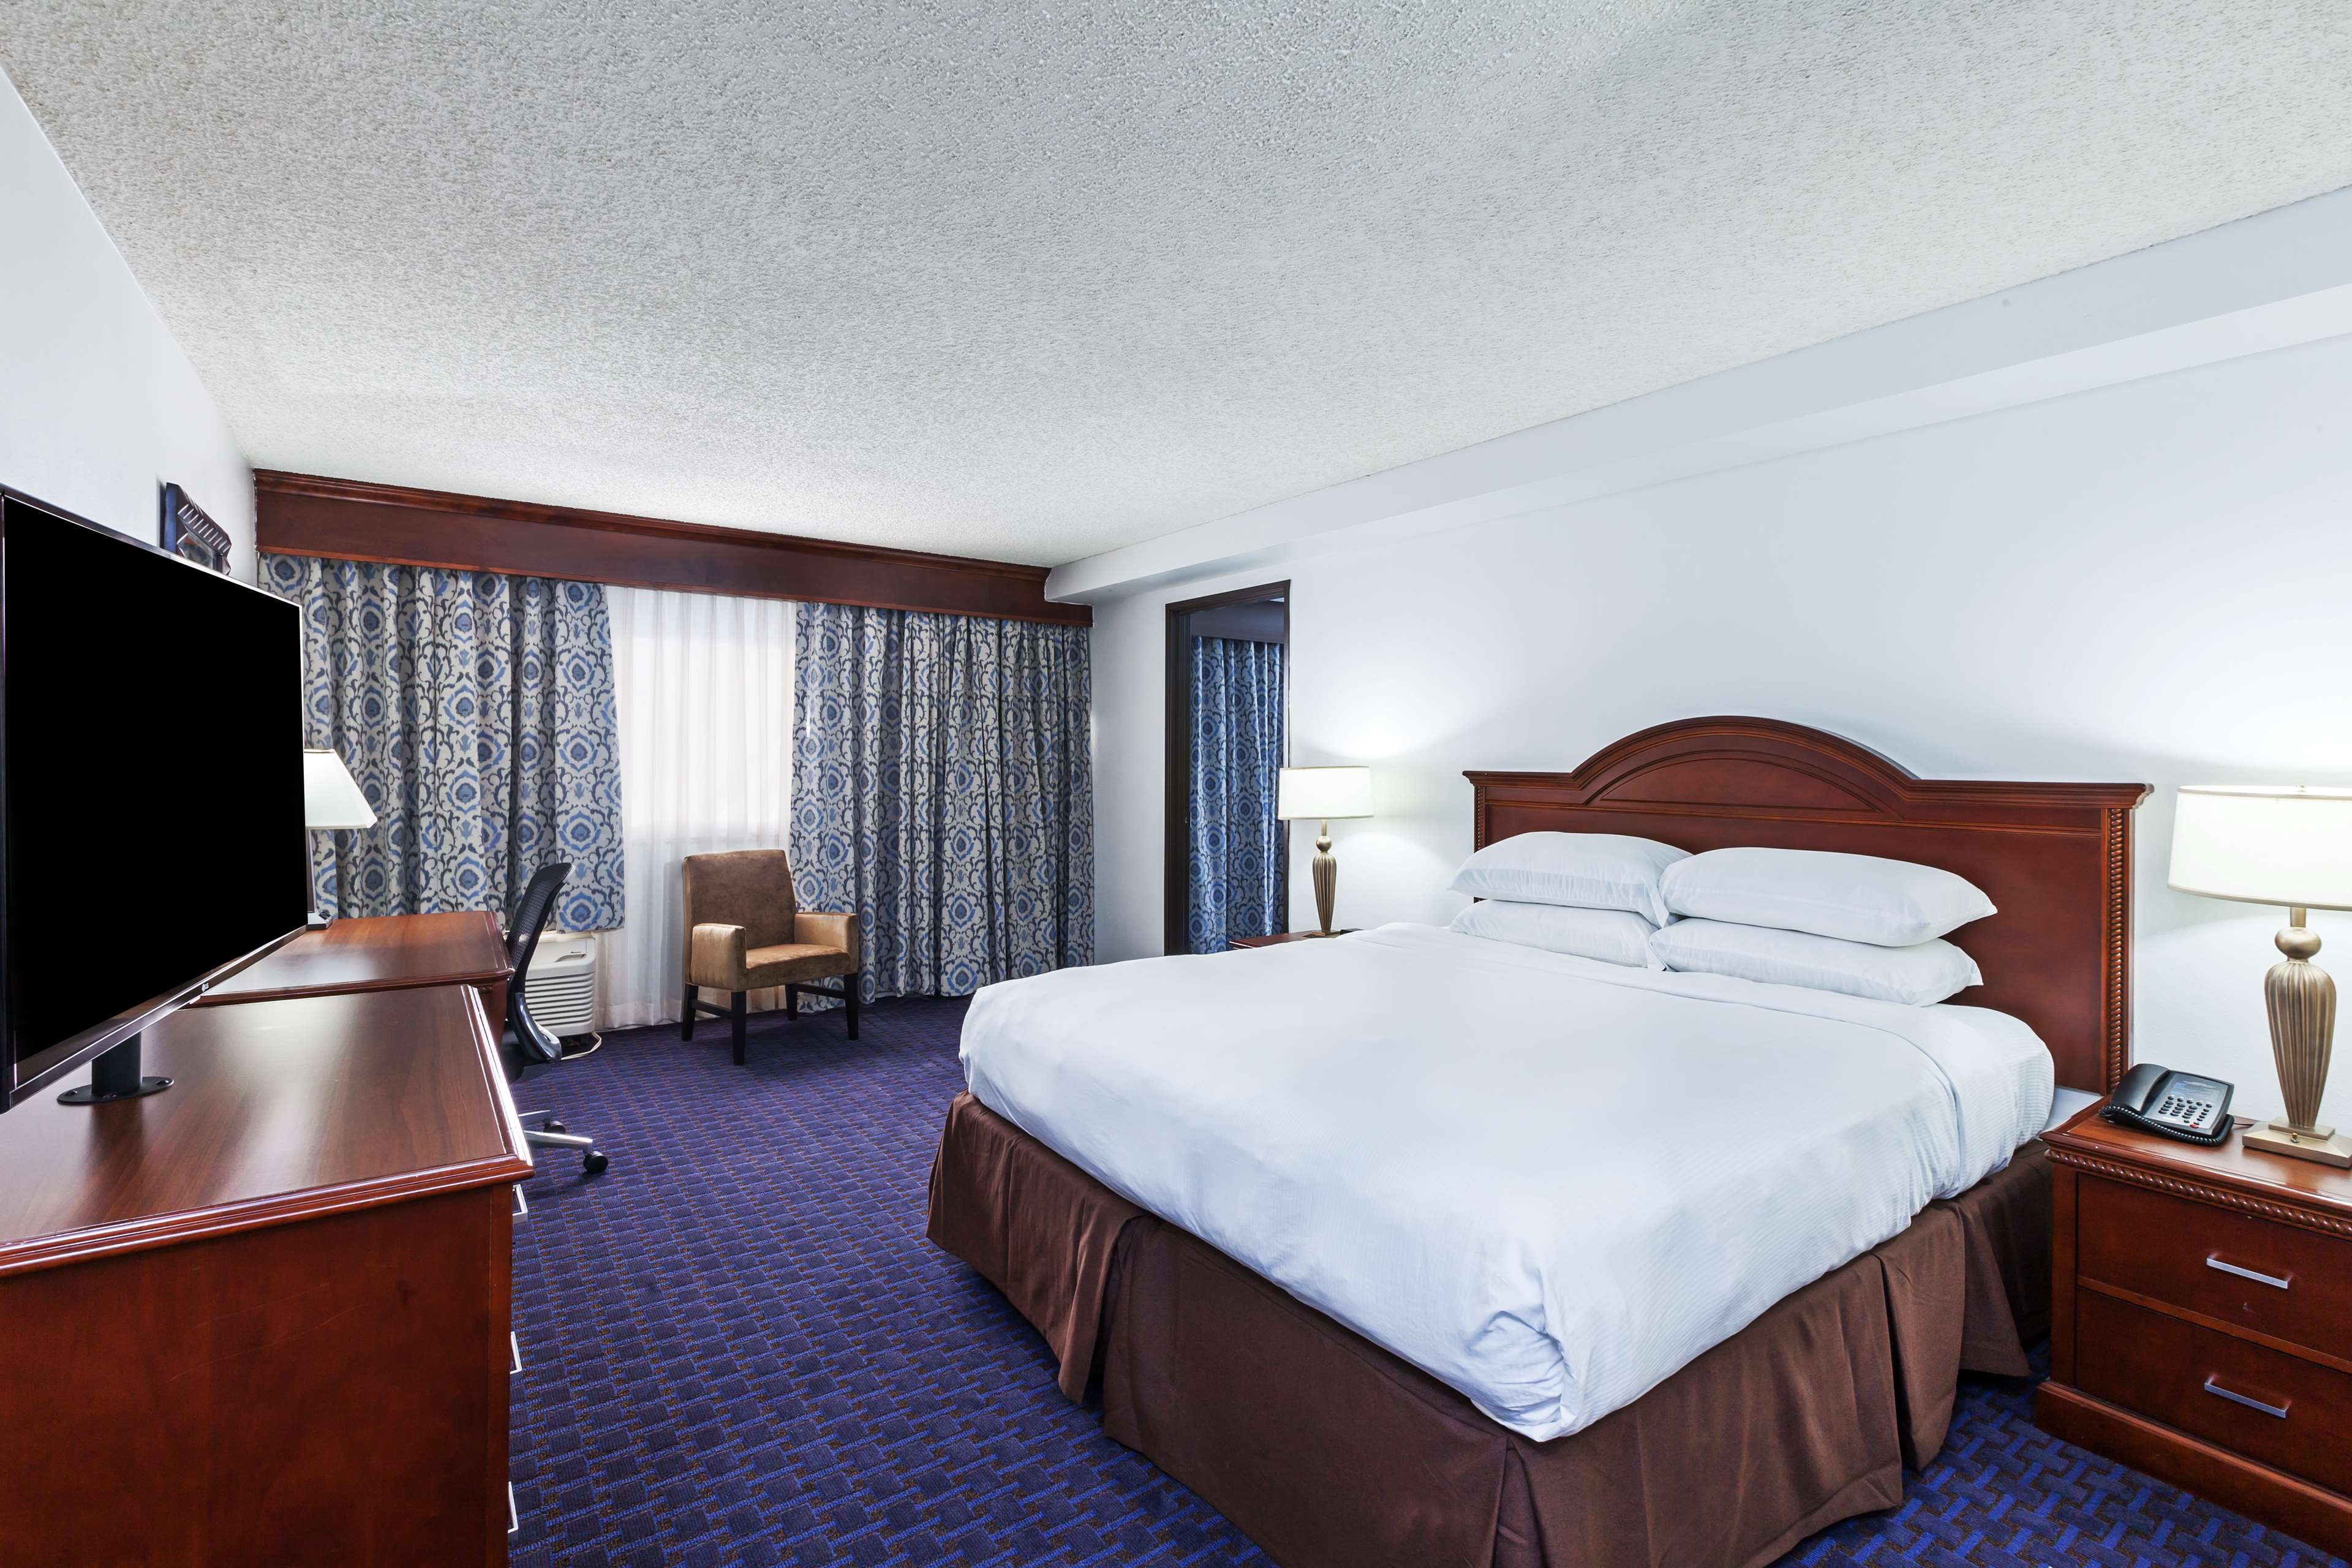 Hilton Waco image 49